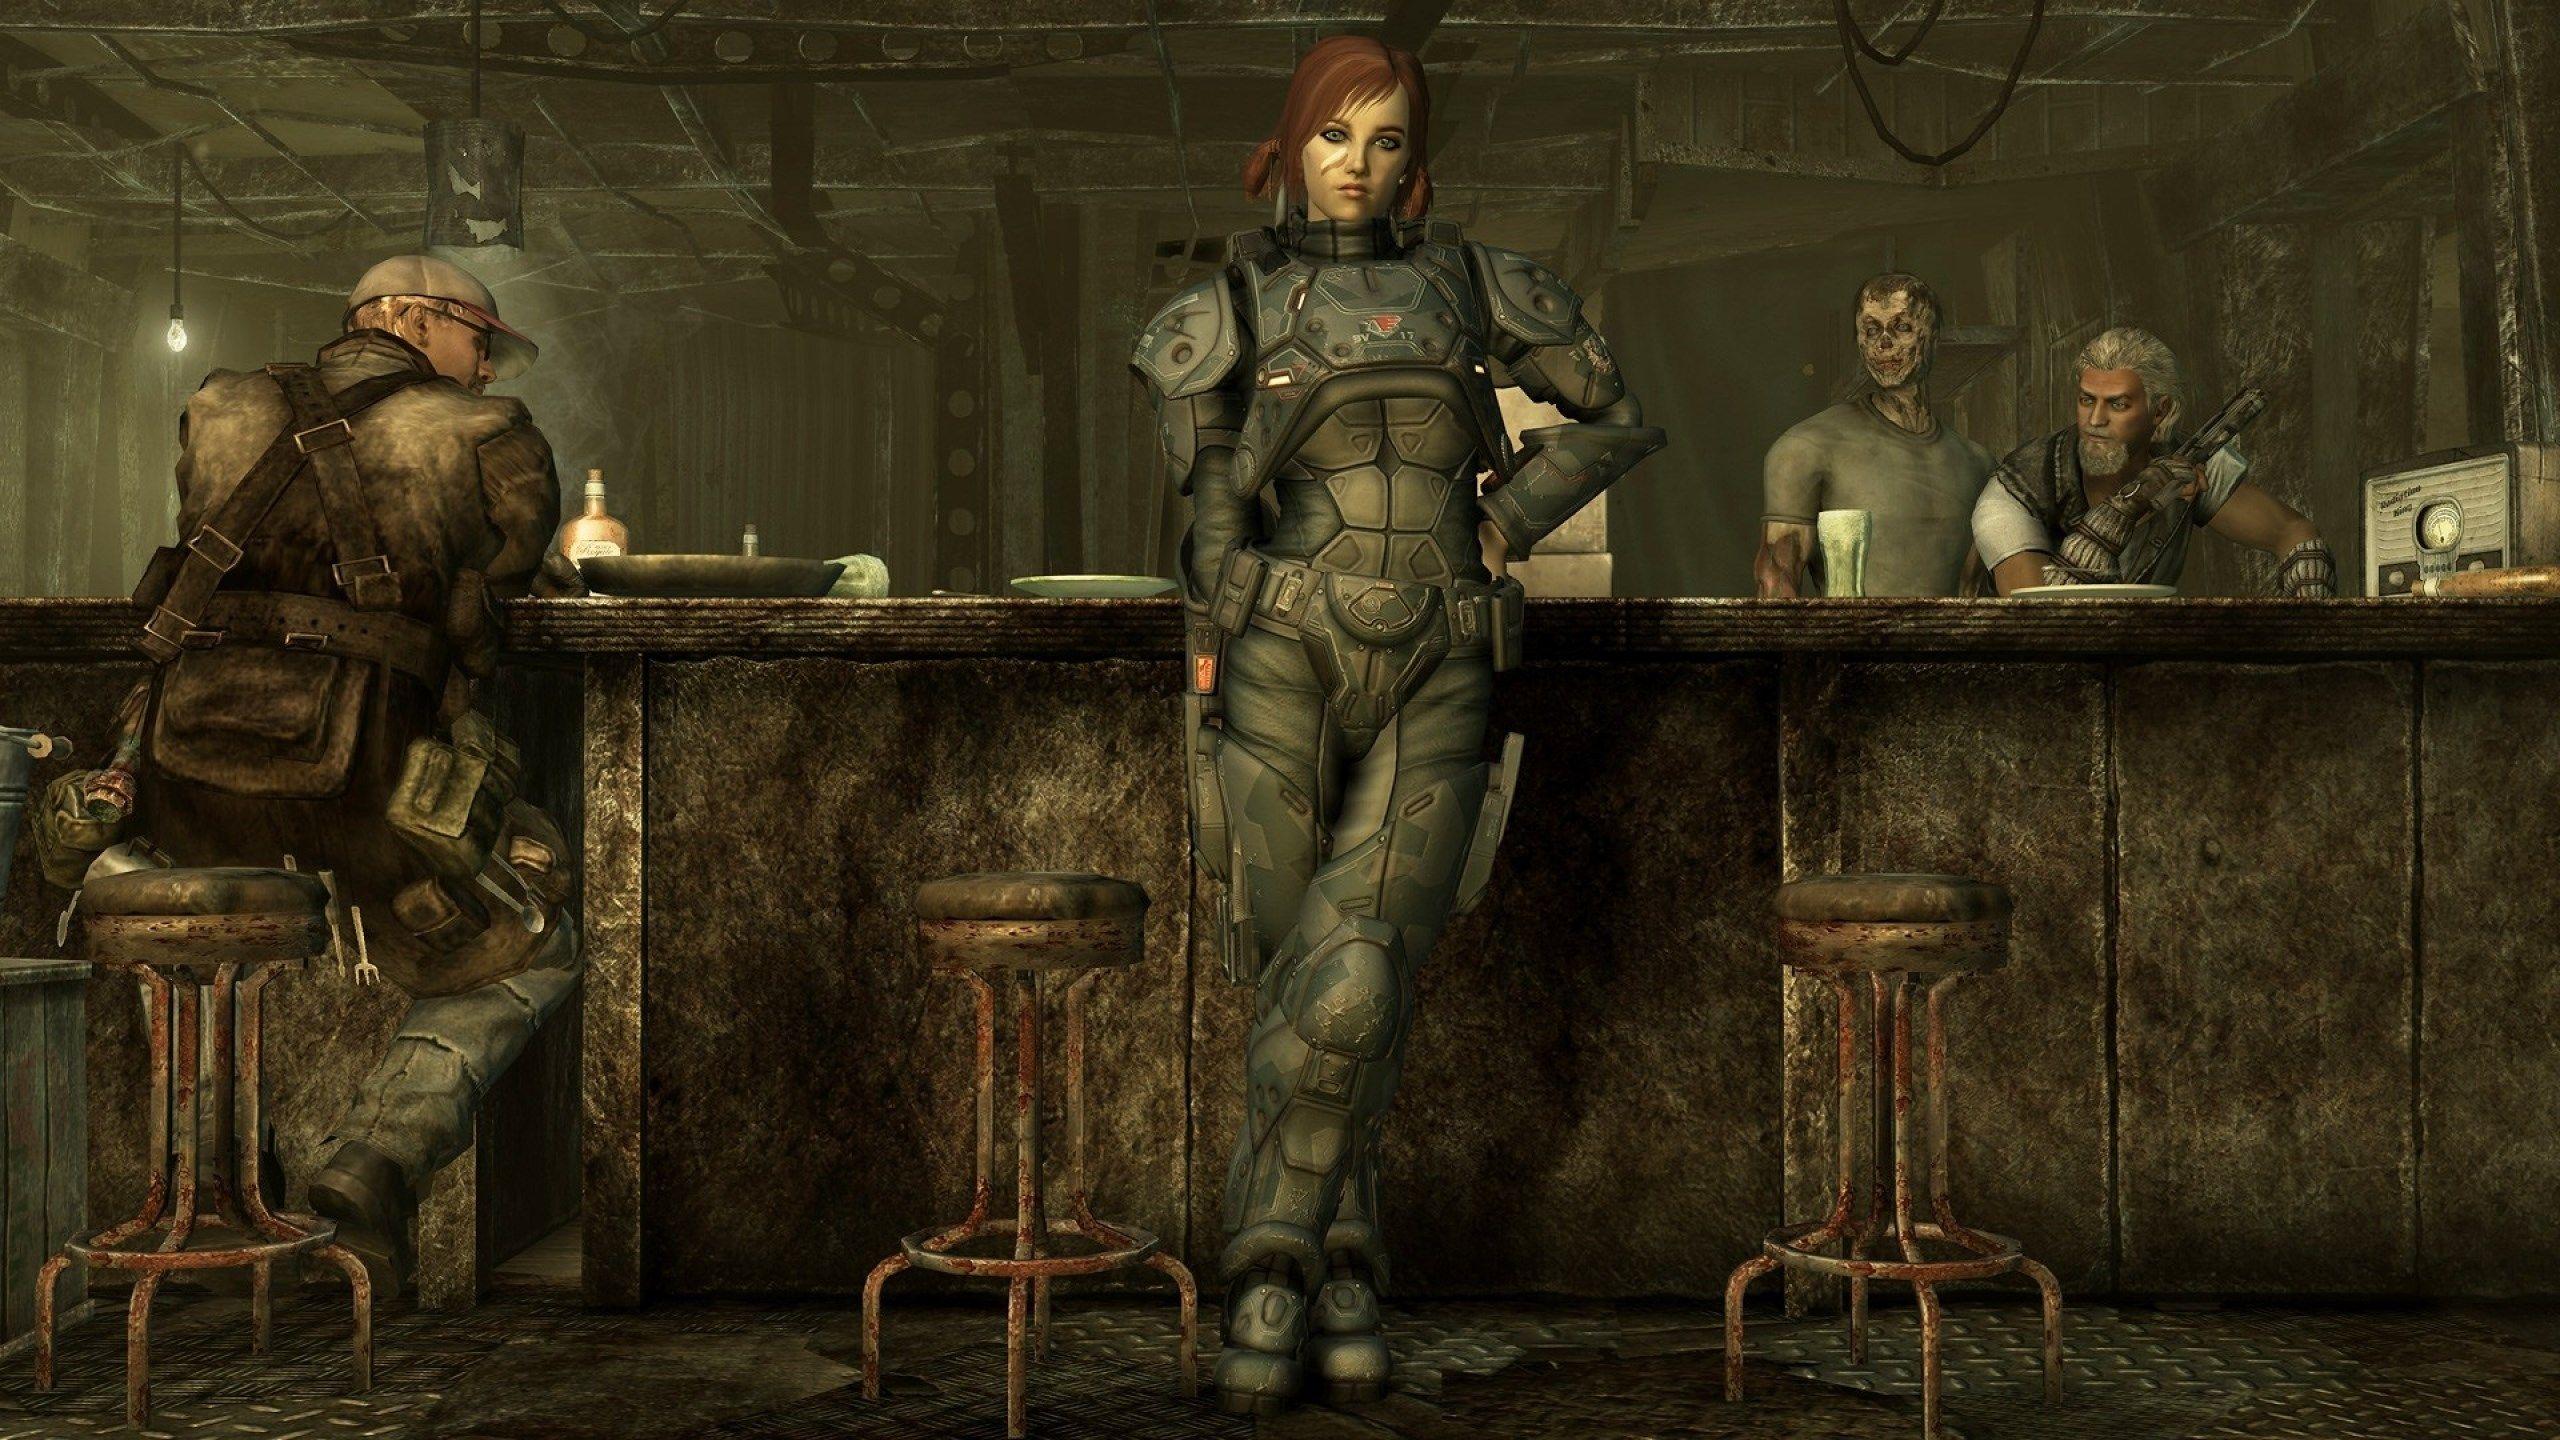 video game fallout wallpapers hd ololoshka Pinterest Best